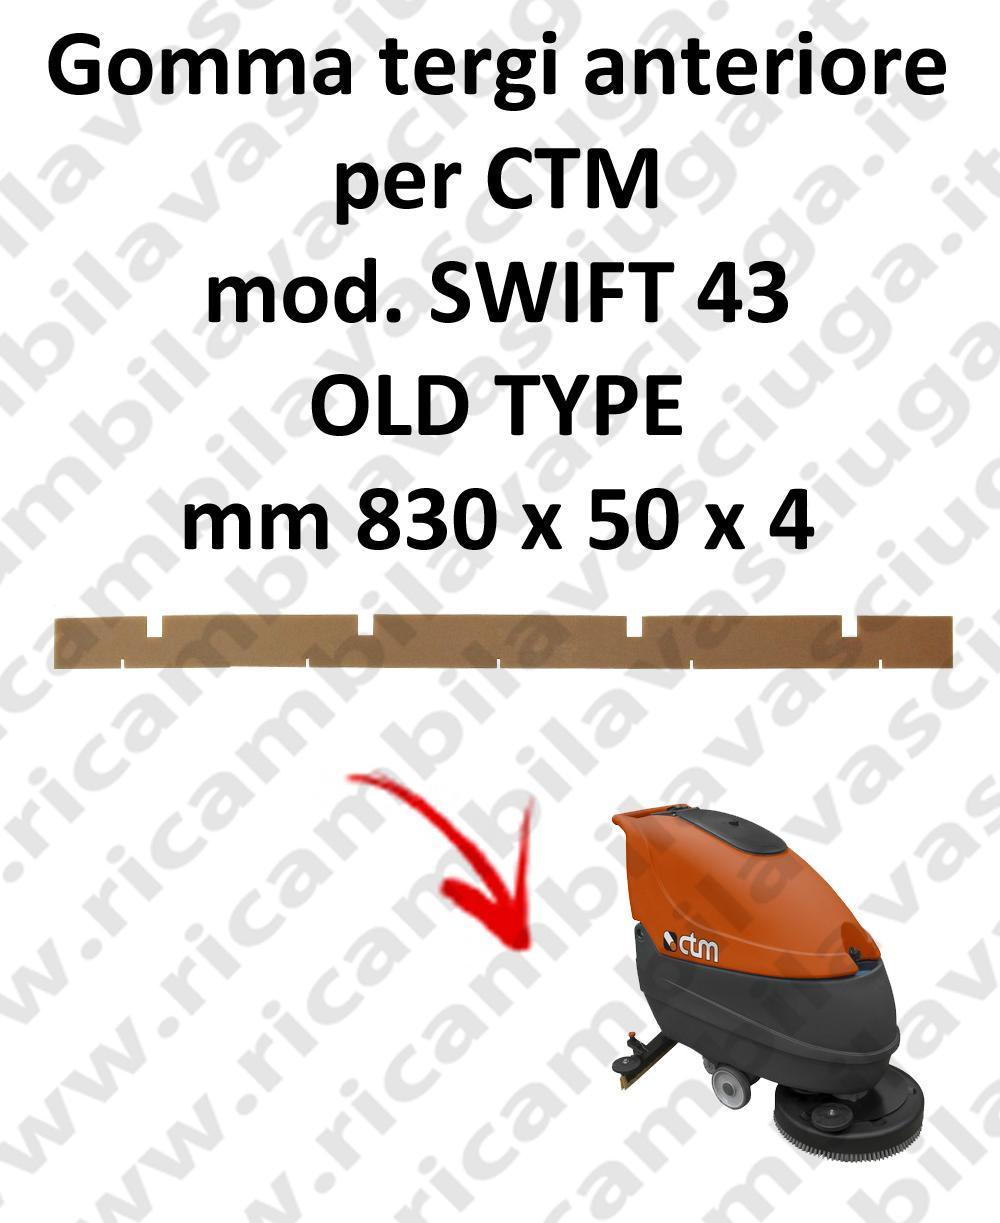 SWIFT 43 OLD TYPE BAVETTE AVANT pour CTM